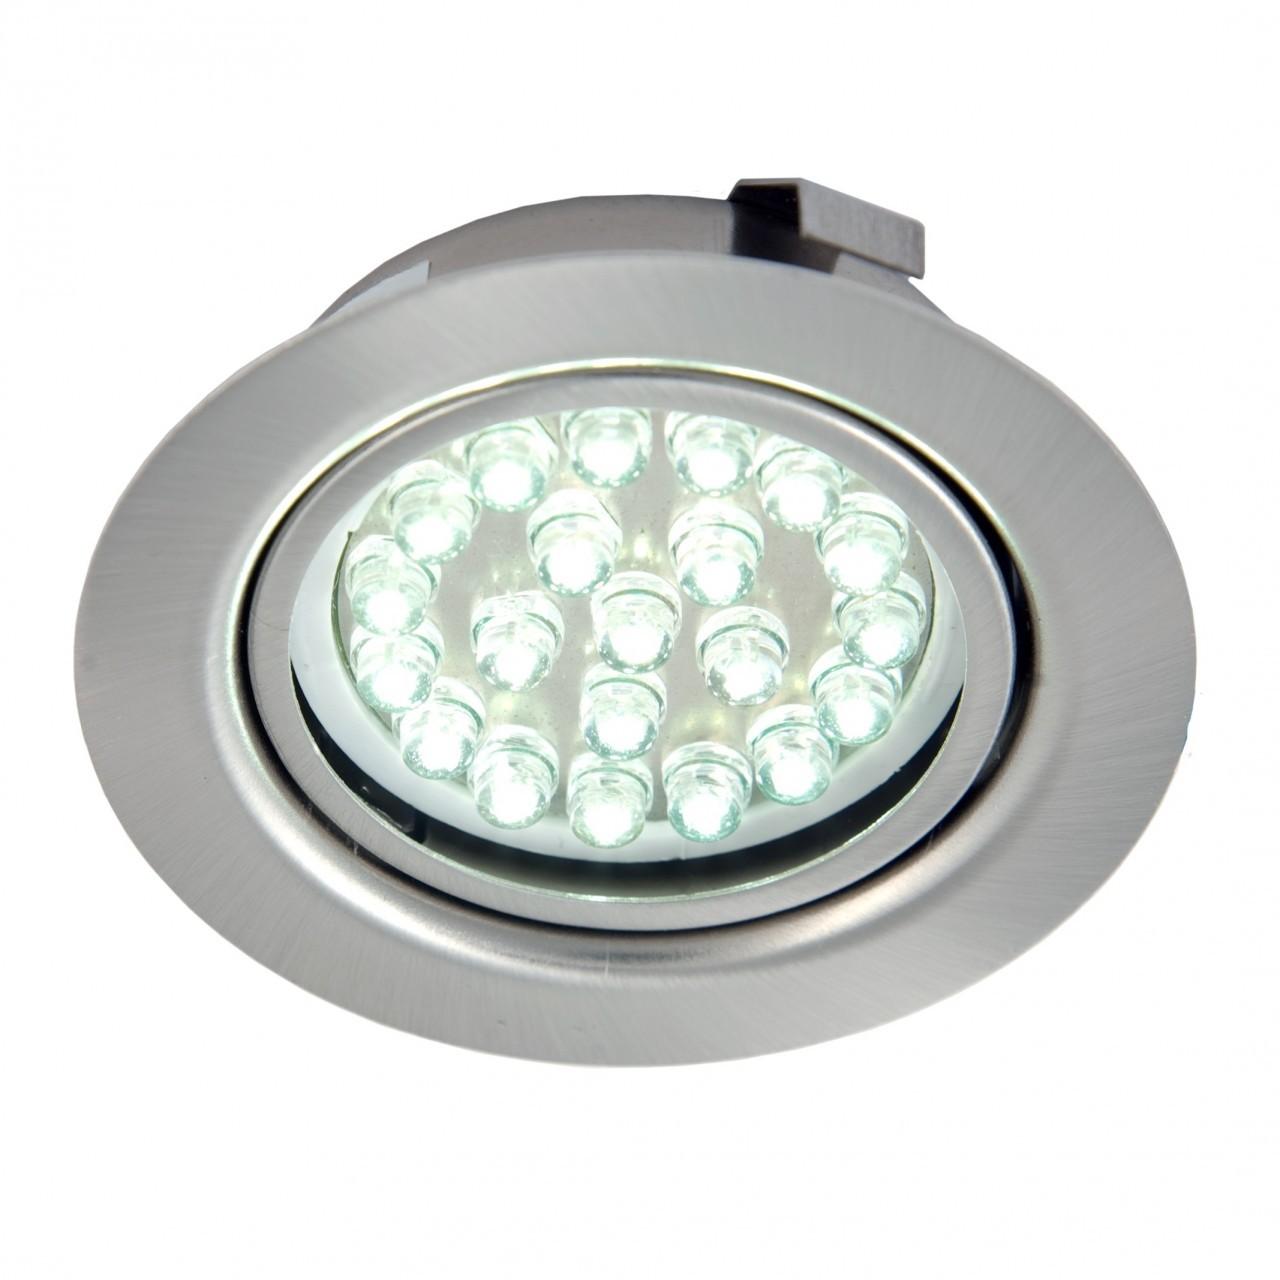 Trinity lighting etc ltd in trinidad compact fluorescent bulbs products arubaitofo Gallery